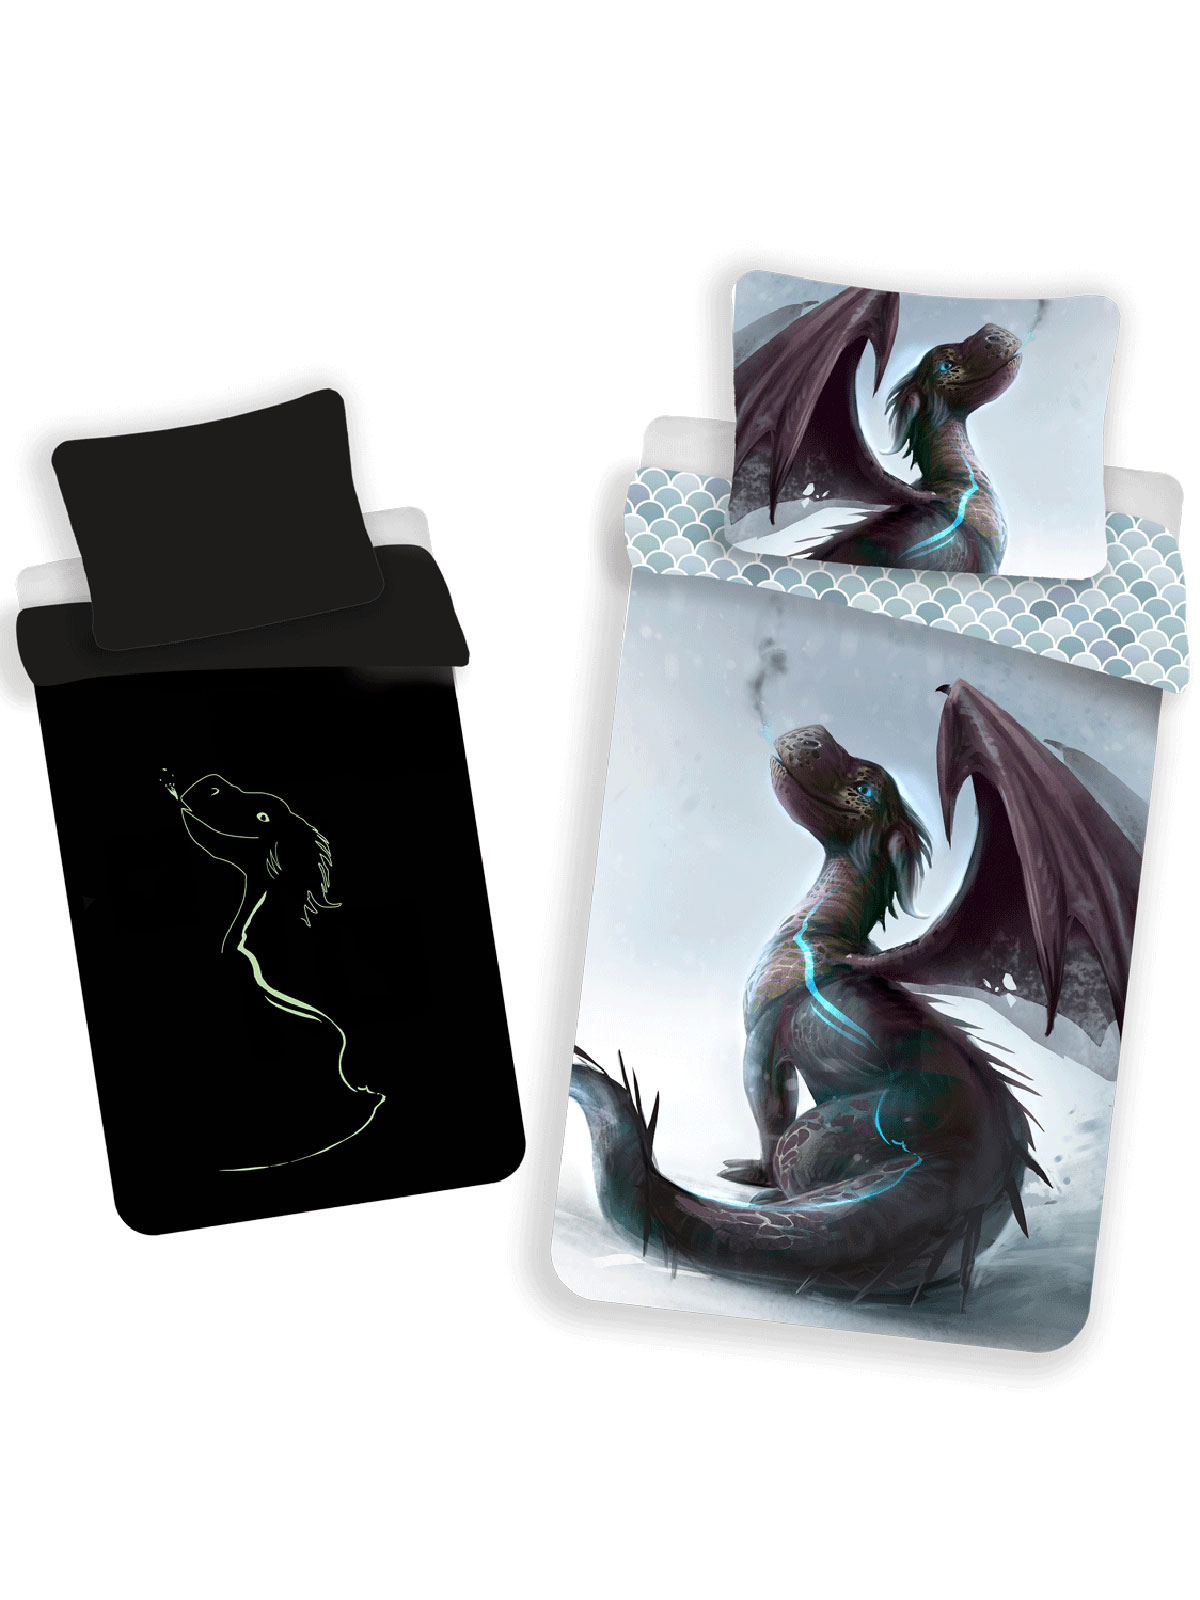 Dragon Glow in the Dark Single Duvet Cover - European Size